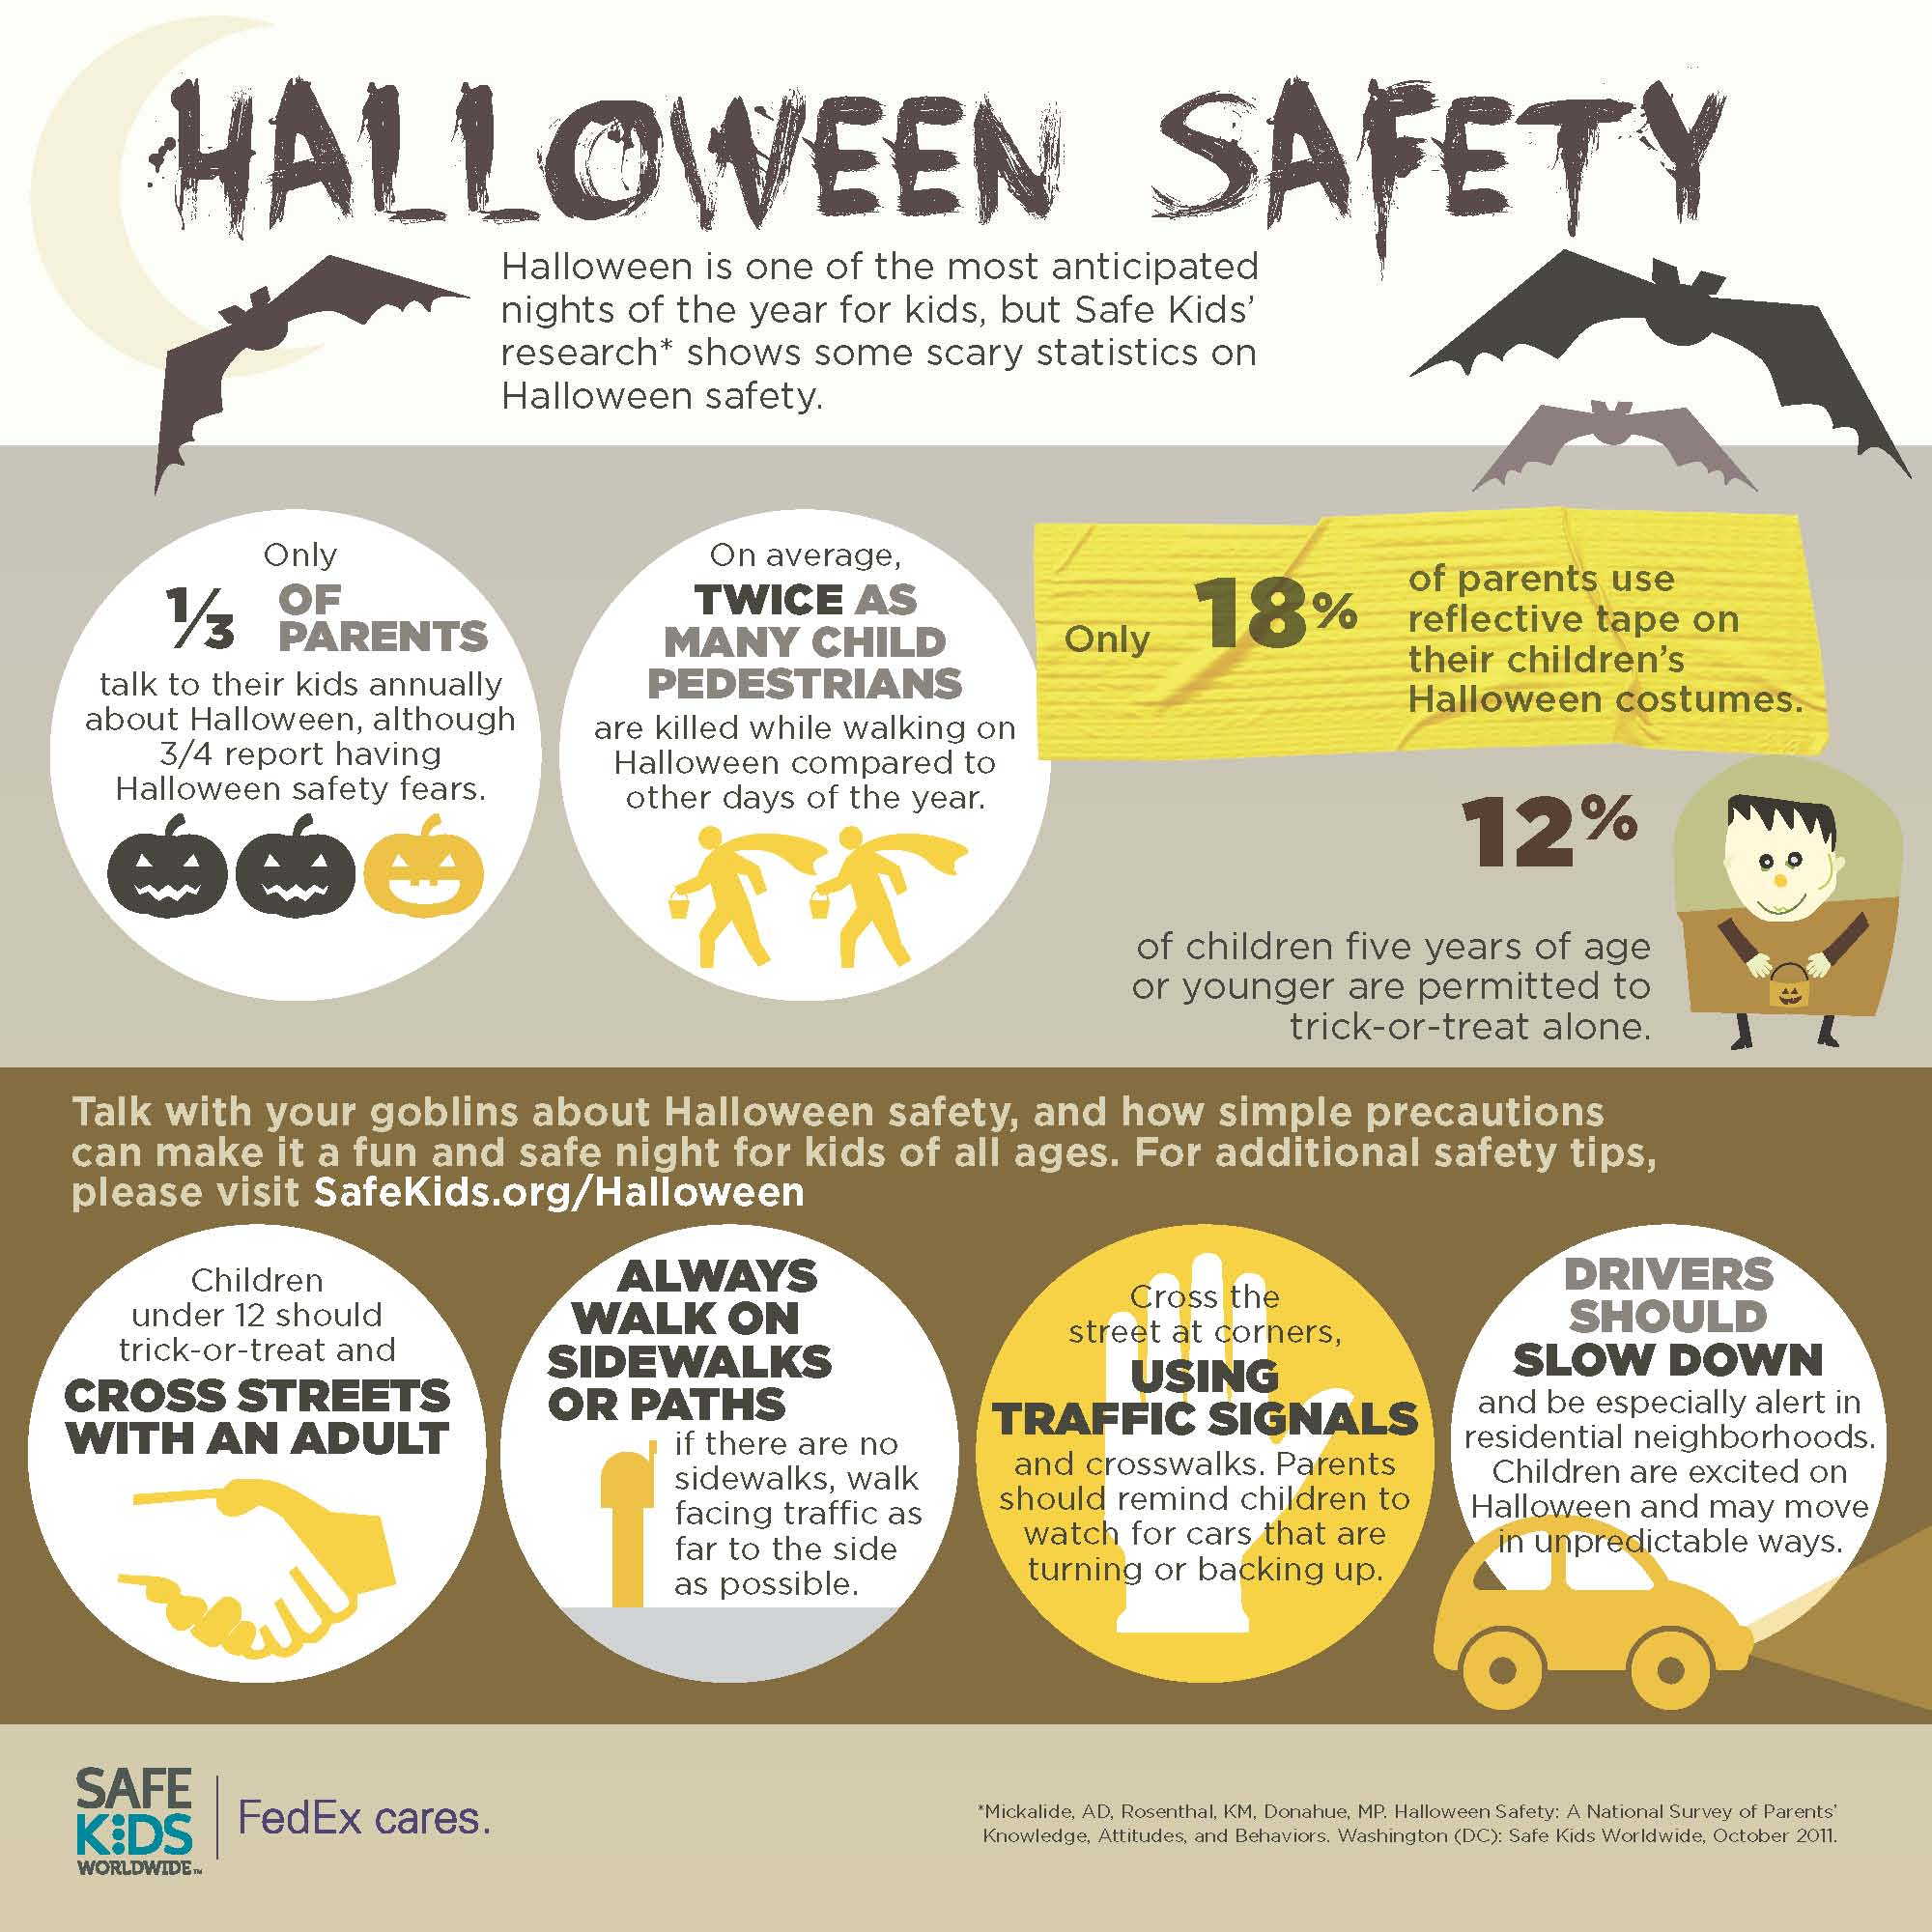 fedex_halloween_infographic_v9